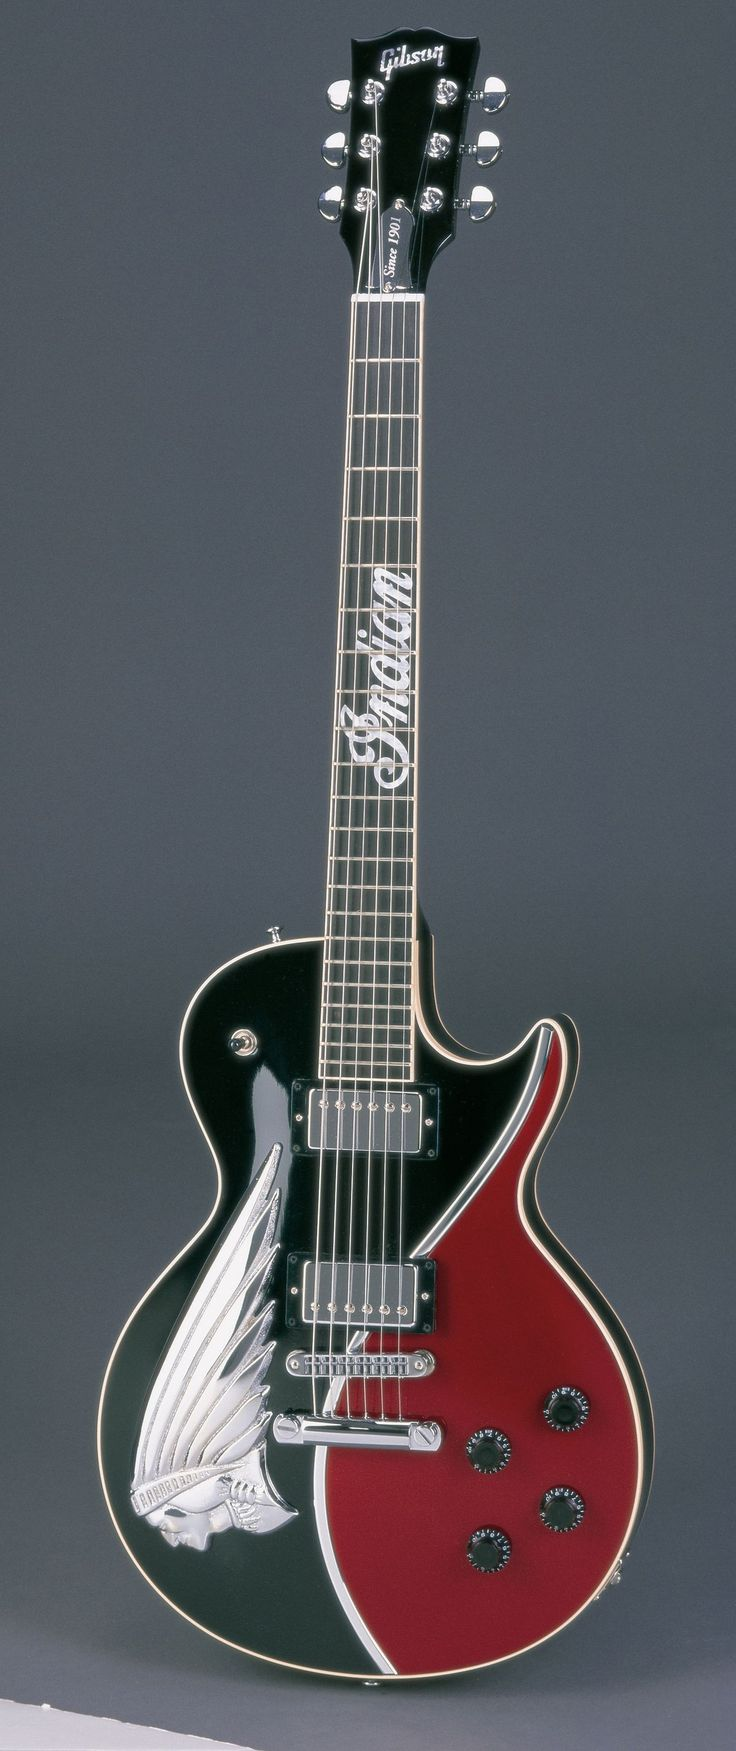 1315 best guitars images on Pinterest | Bass guitars, Vintage ...